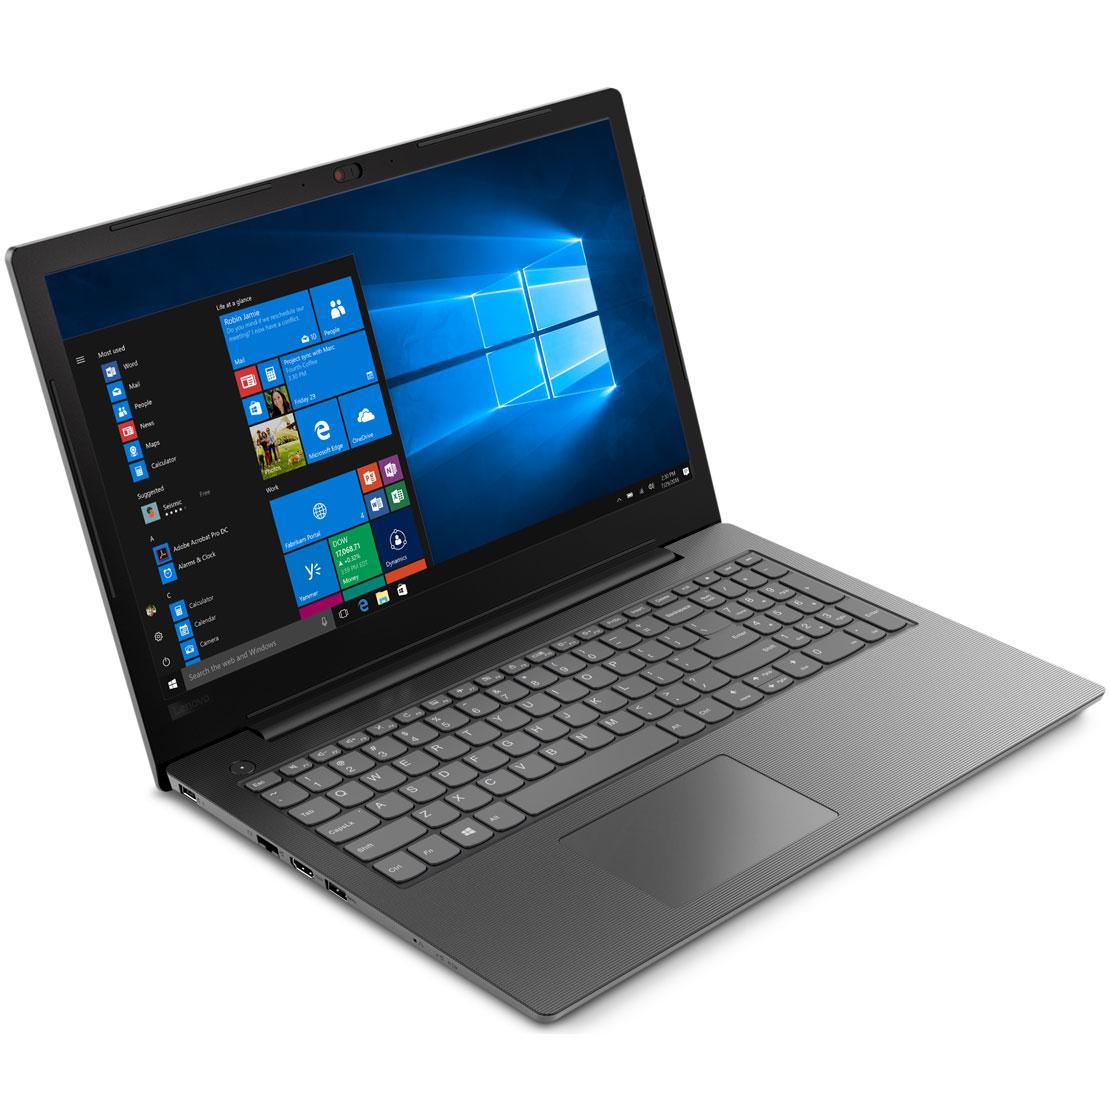 "PC portable Lenovo V130-15IKB (81HN00H5FR) Intel Core i3-6006U 4 Go SSD 256 Go 15.6"" LED Full HD Graveur DVD Wi-Fi AC/Bluetooth Webcam Windows 10 Famille 64 bits"